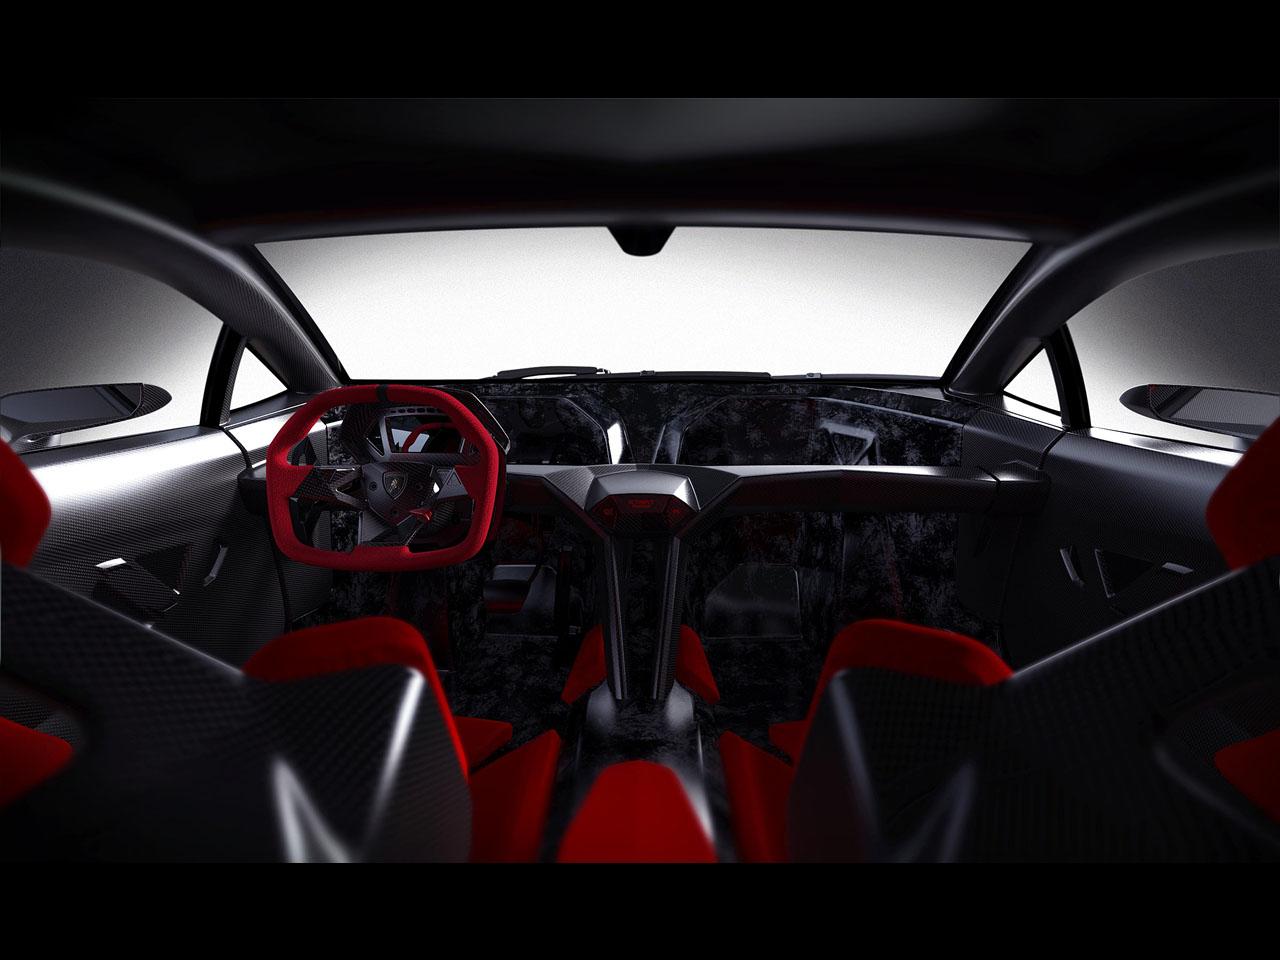 http://2.bp.blogspot.com/_pXnW36GSjVA/TLAtjaoSKII/AAAAAAAACs8/9ICVCq4wGlU/s1600/Lamborghini+Sesto+Elemento+High+End+Technology+Dasshboard+design.jpg